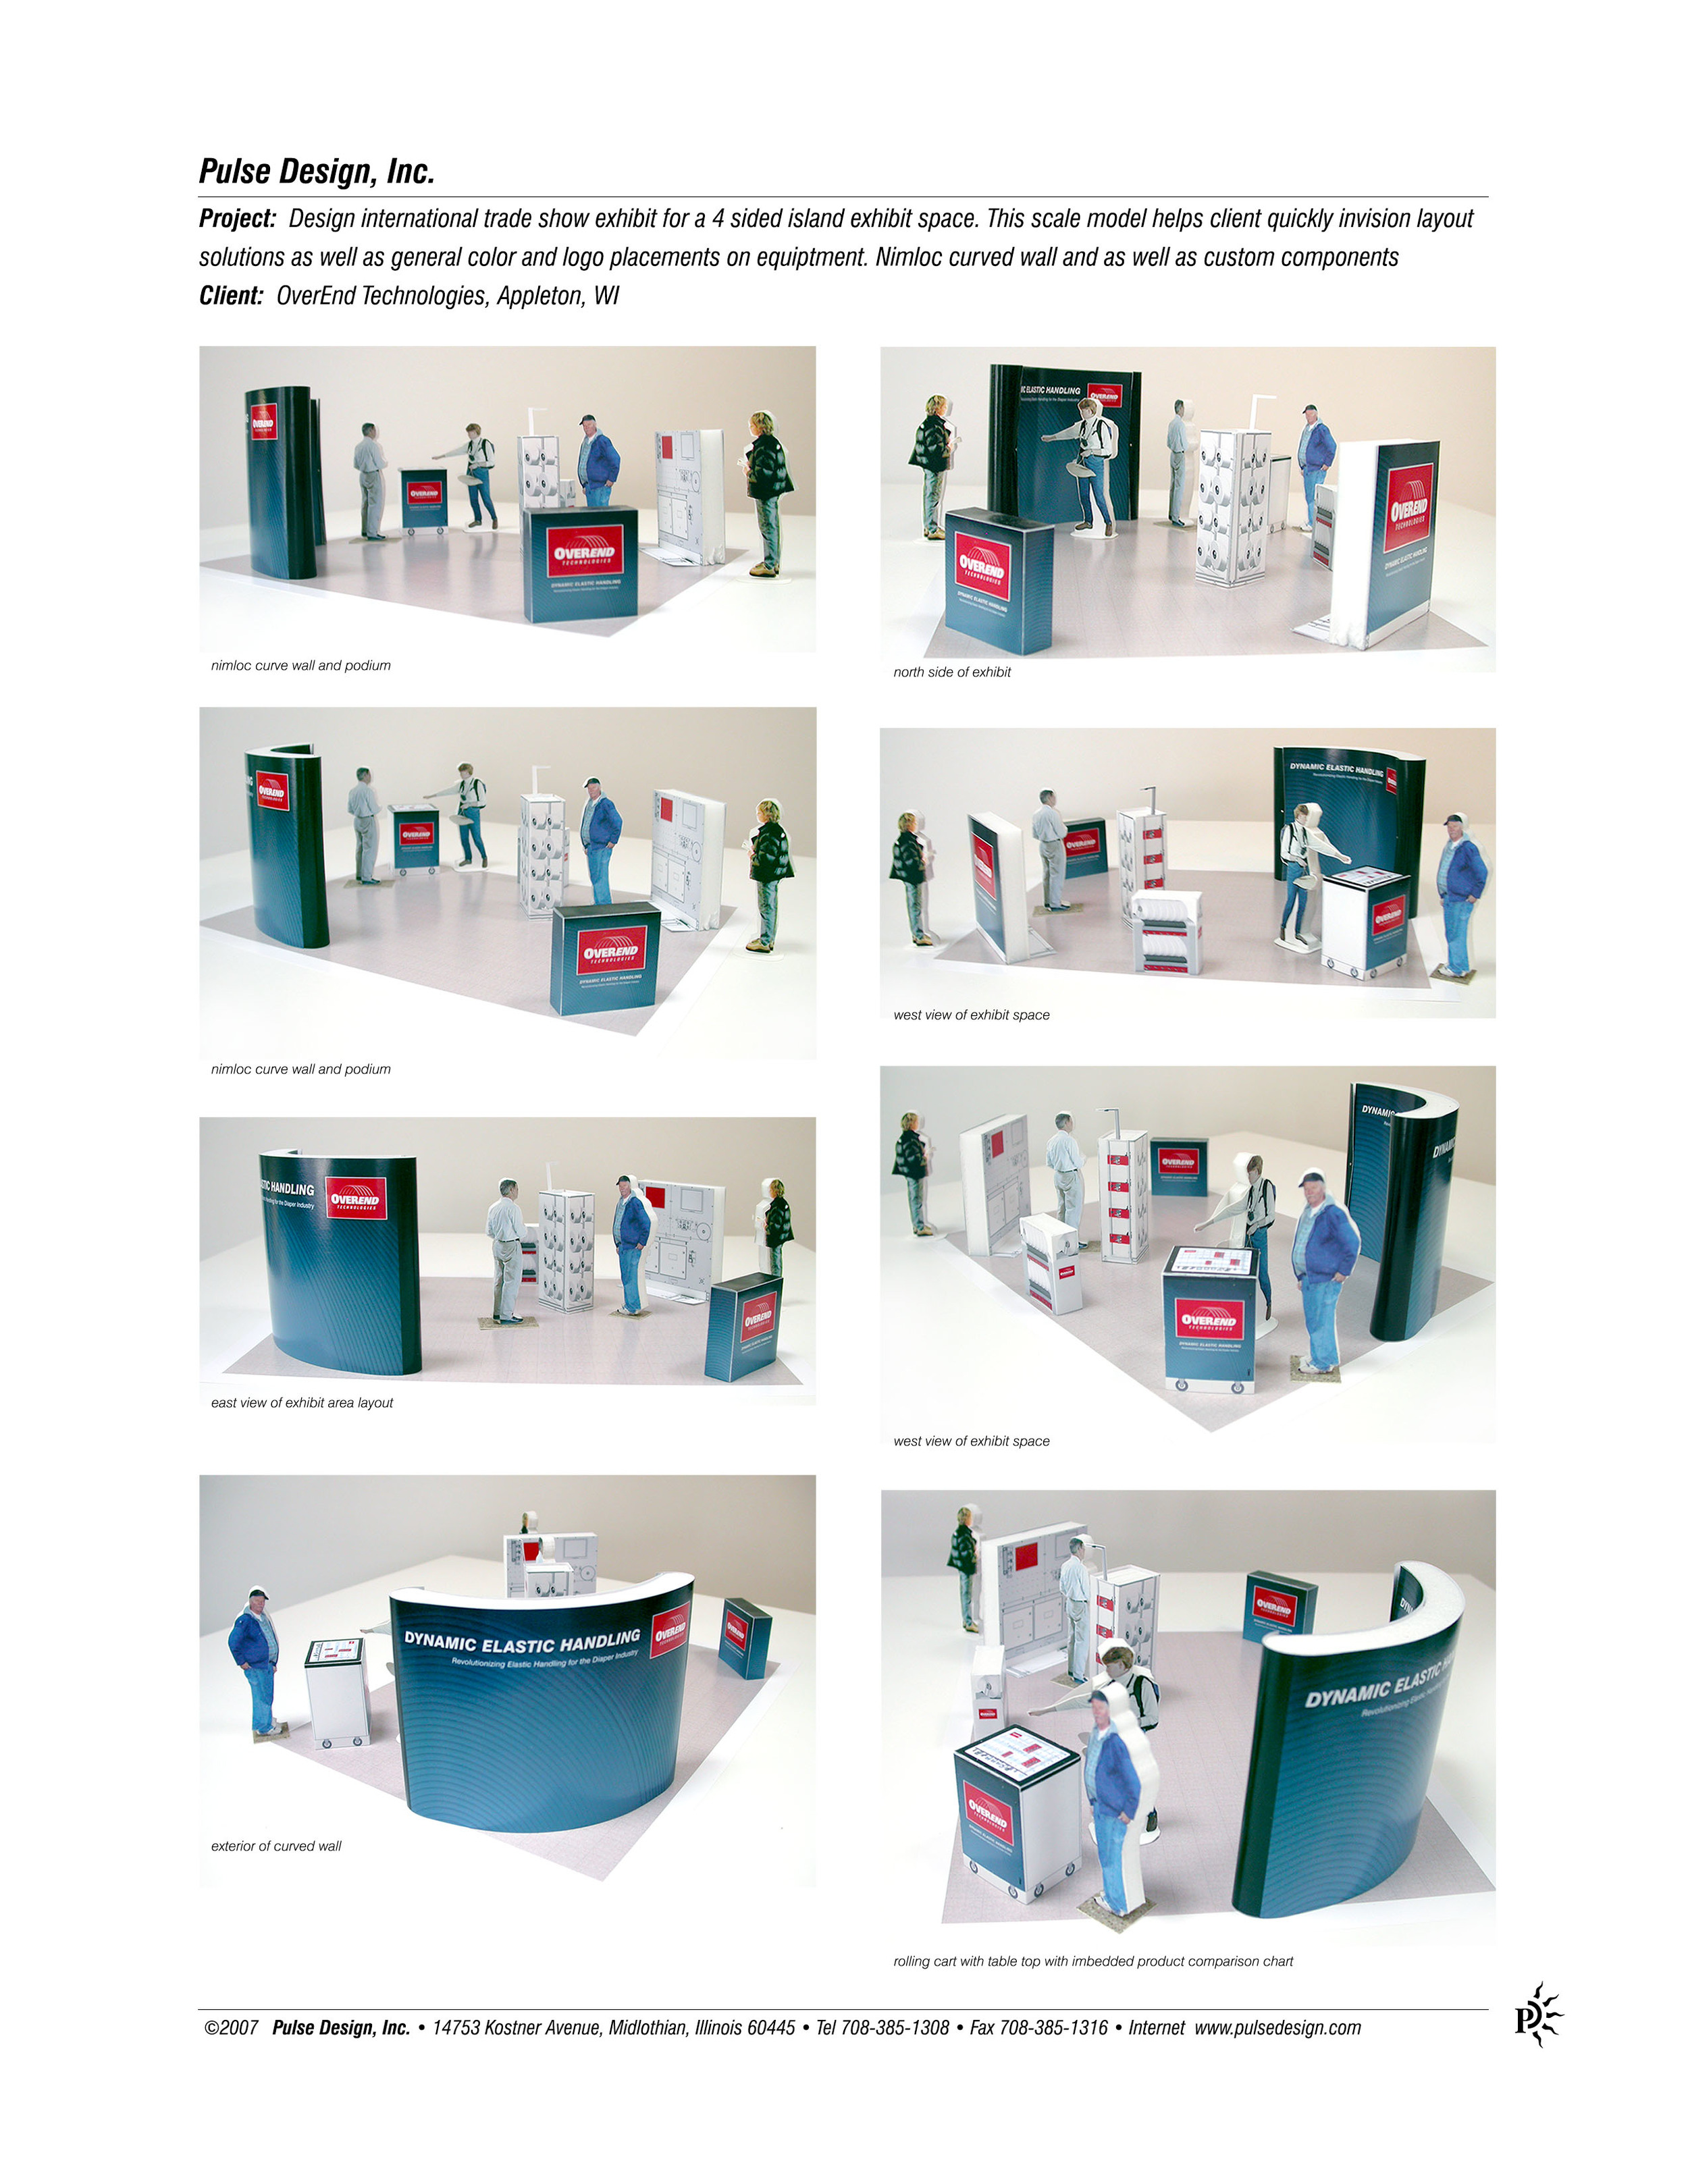 Overend-Trade-Show-Model-Pulse-Design-Inc.jpg